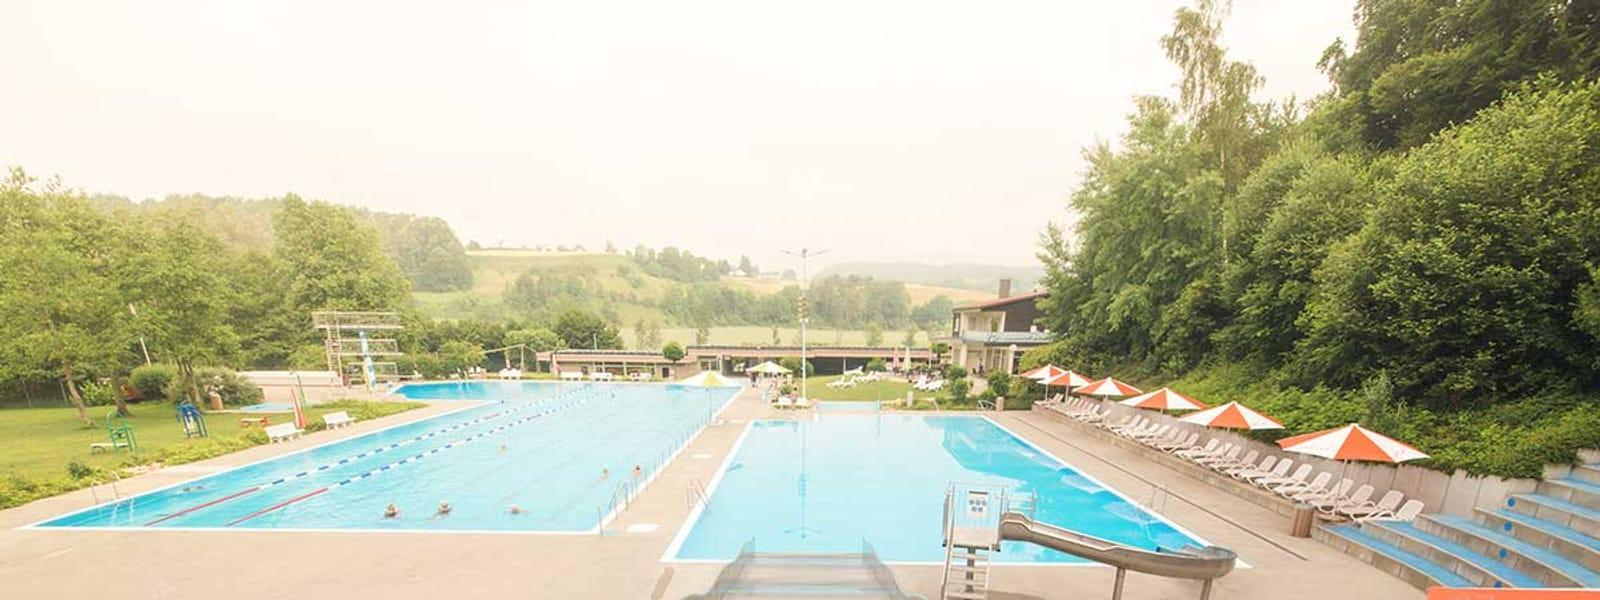 Freibad Stockach (21. Juni 2020)